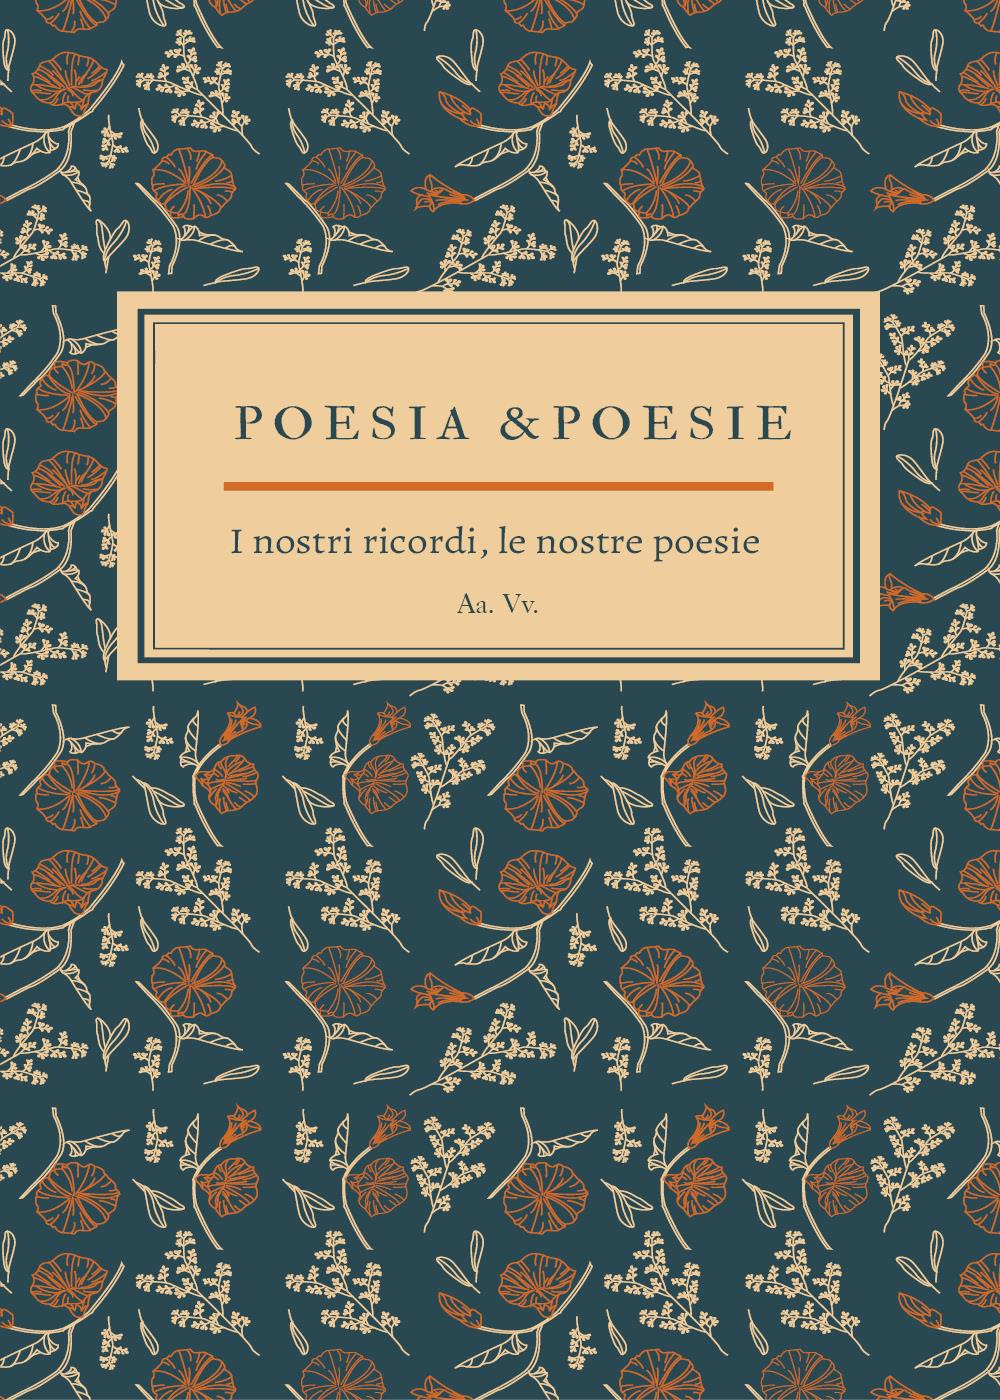 Poesia & Poesie I nostri ricordi, le nostre poesie